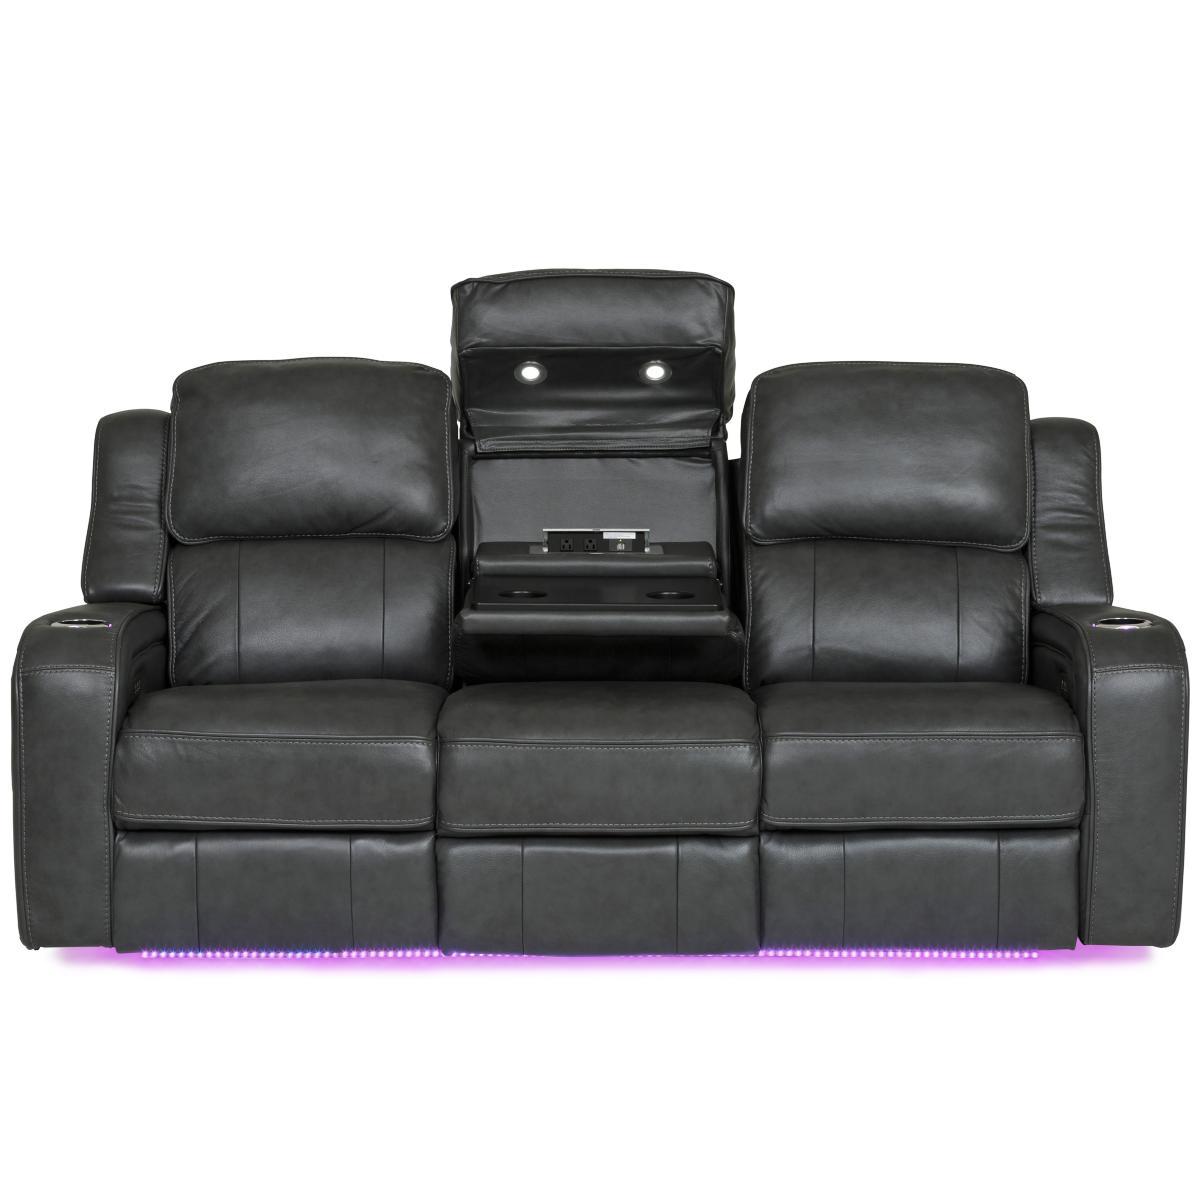 Palermo Leather Power Reclining Sofa - SMOKE | Star Furniture